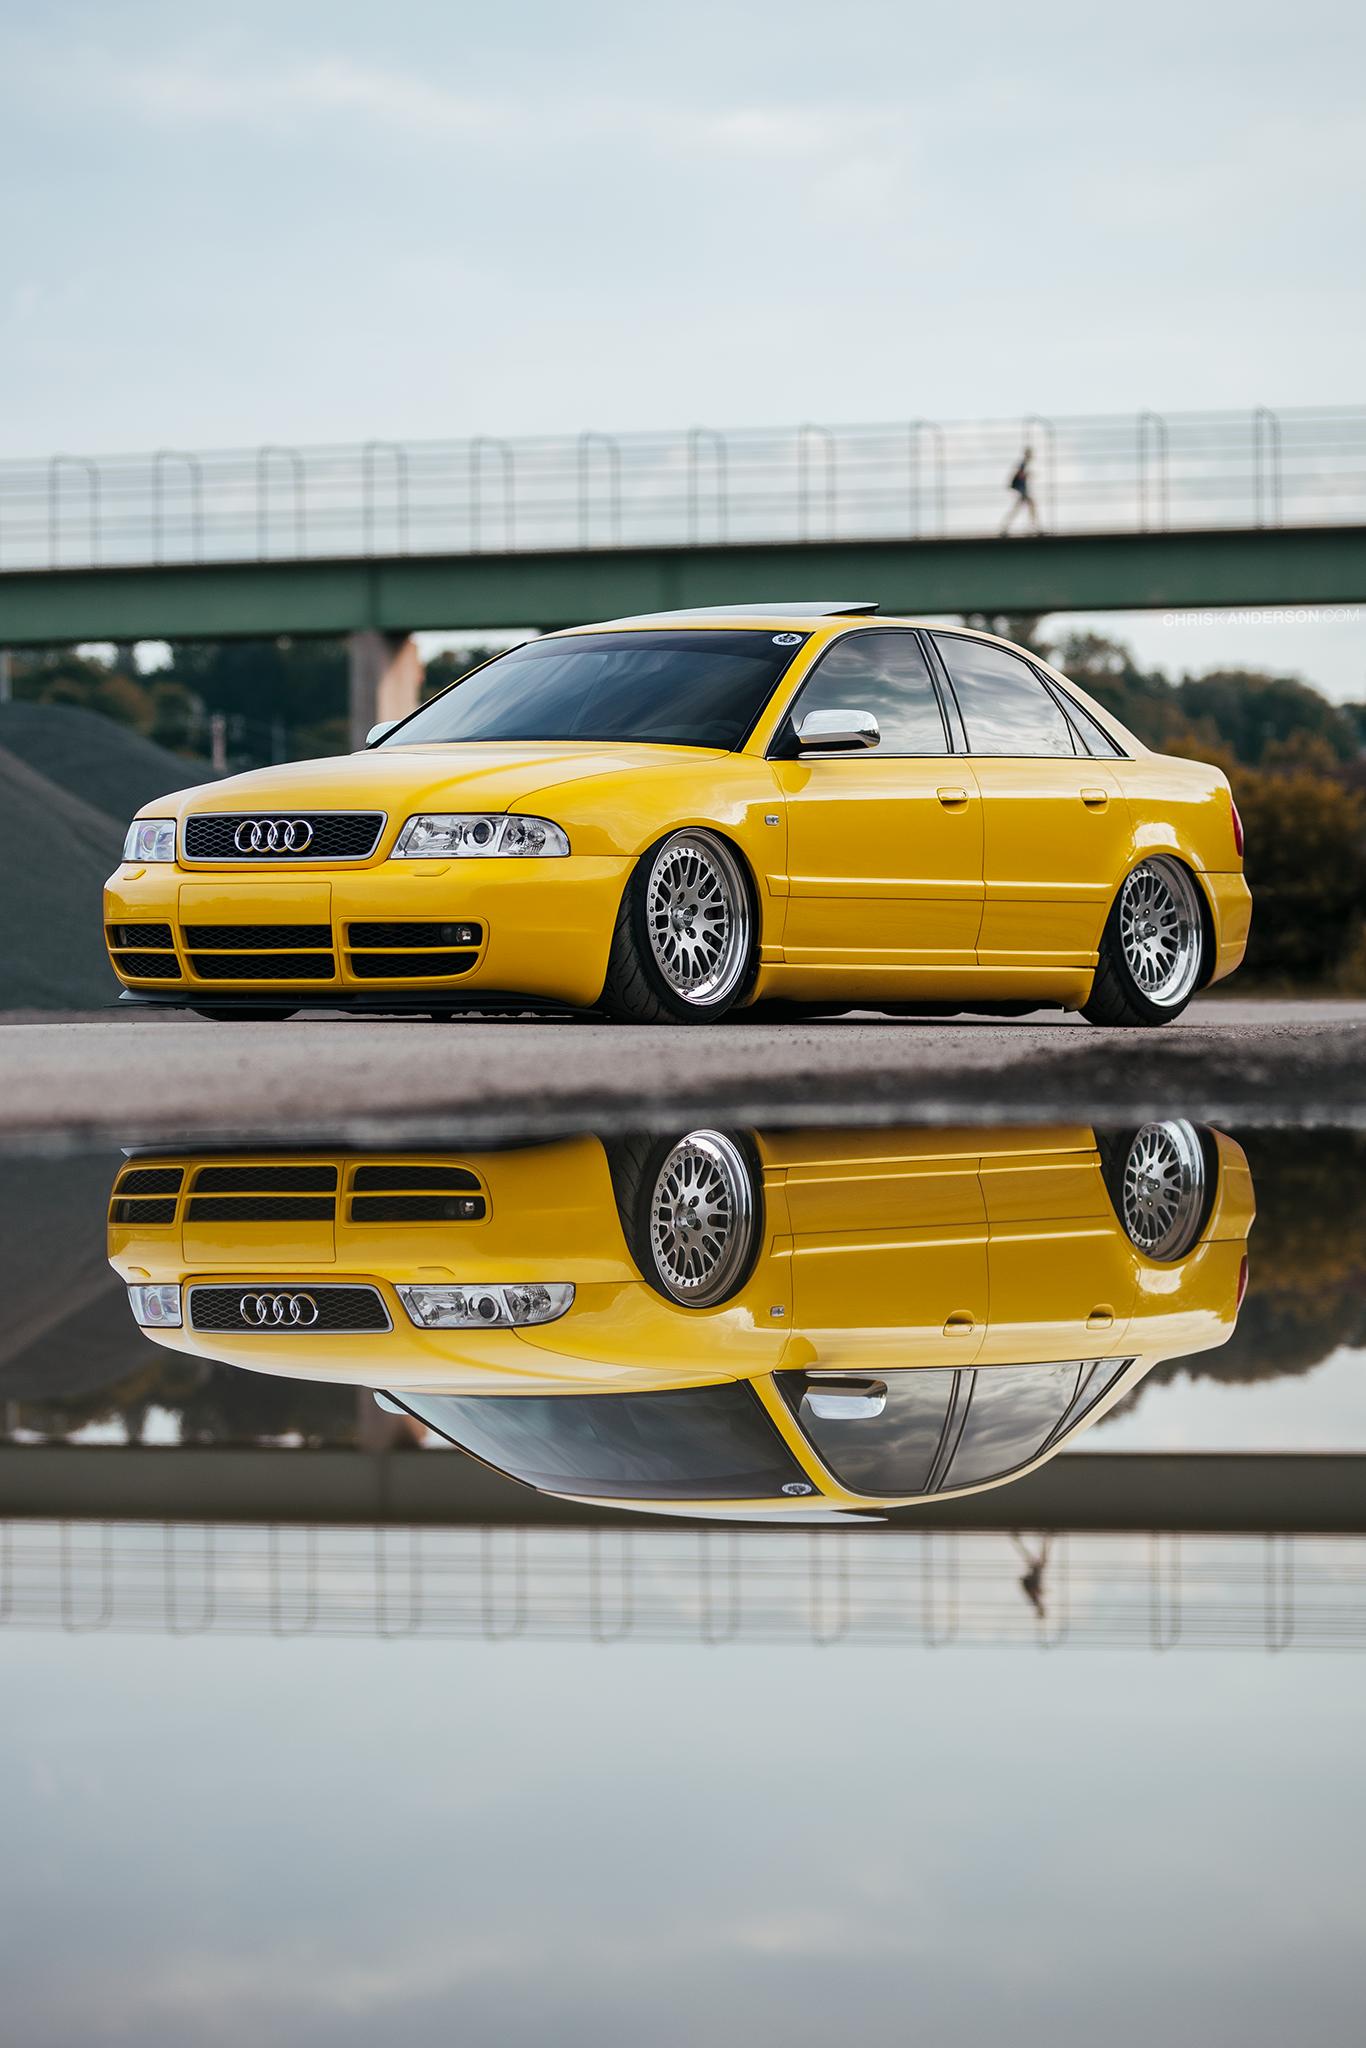 Audi B5 S4 Oc Audi S4 Audi Motorsport Audi Cars